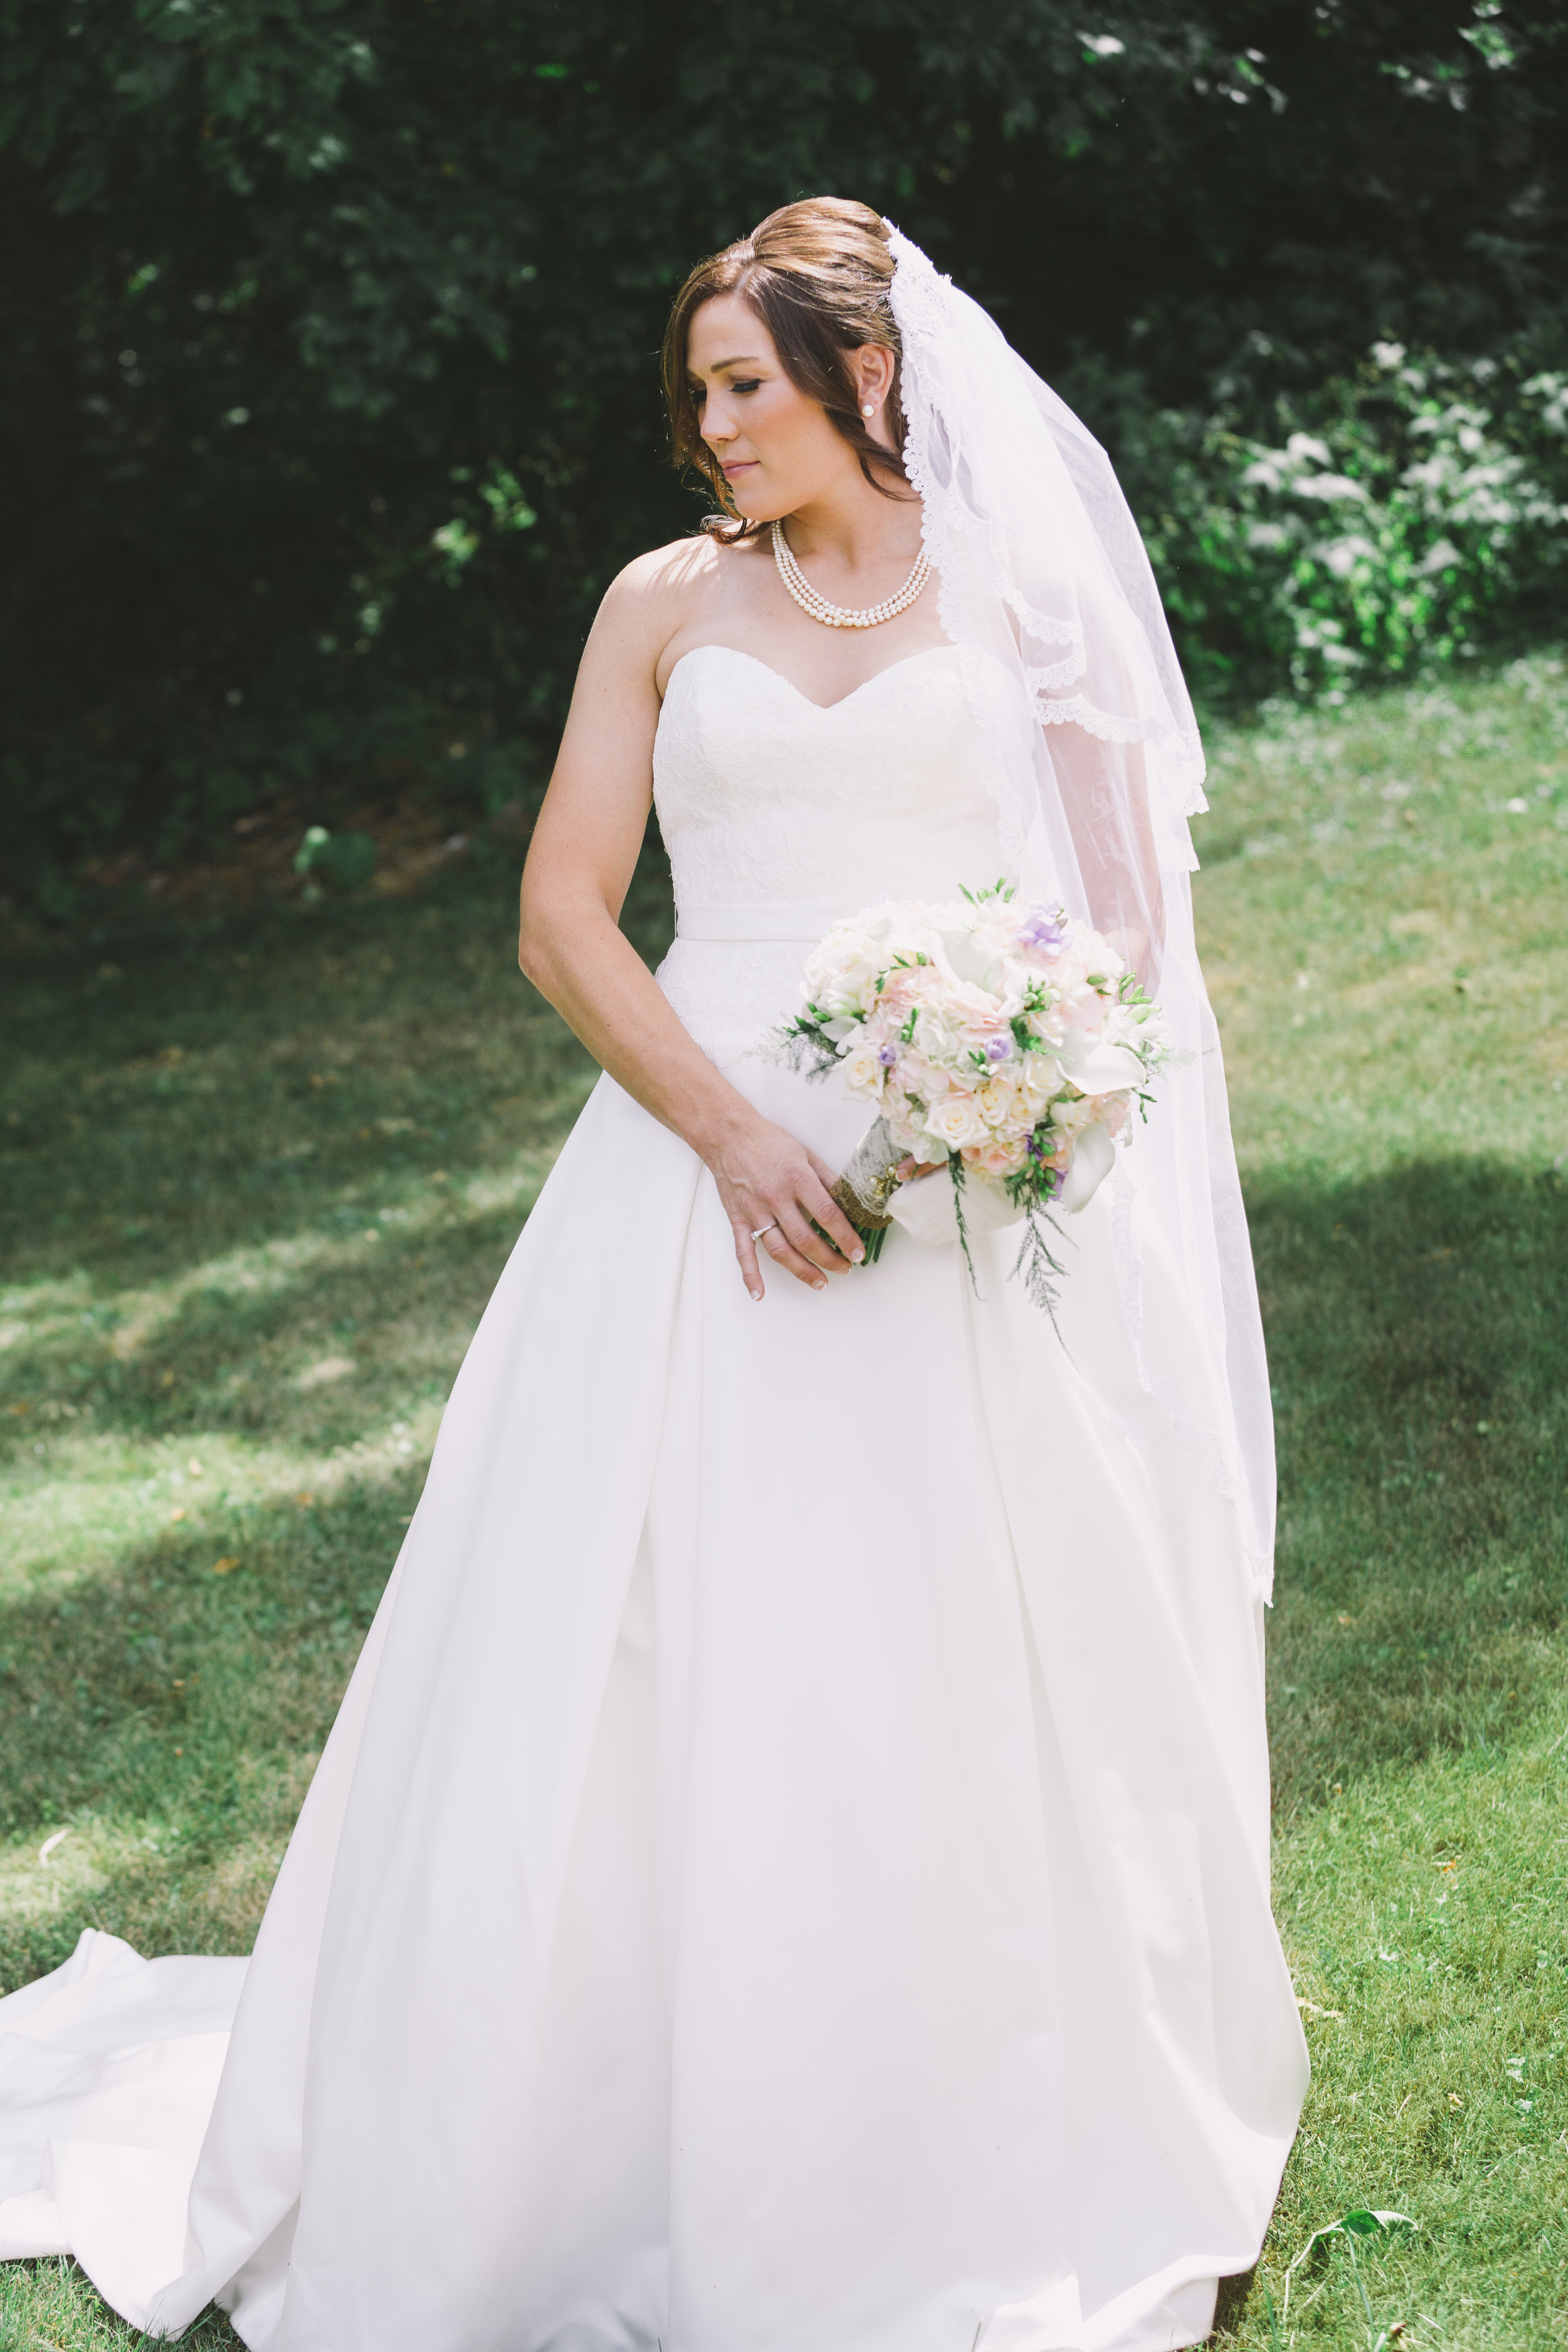 Bride in flowing wedding dress